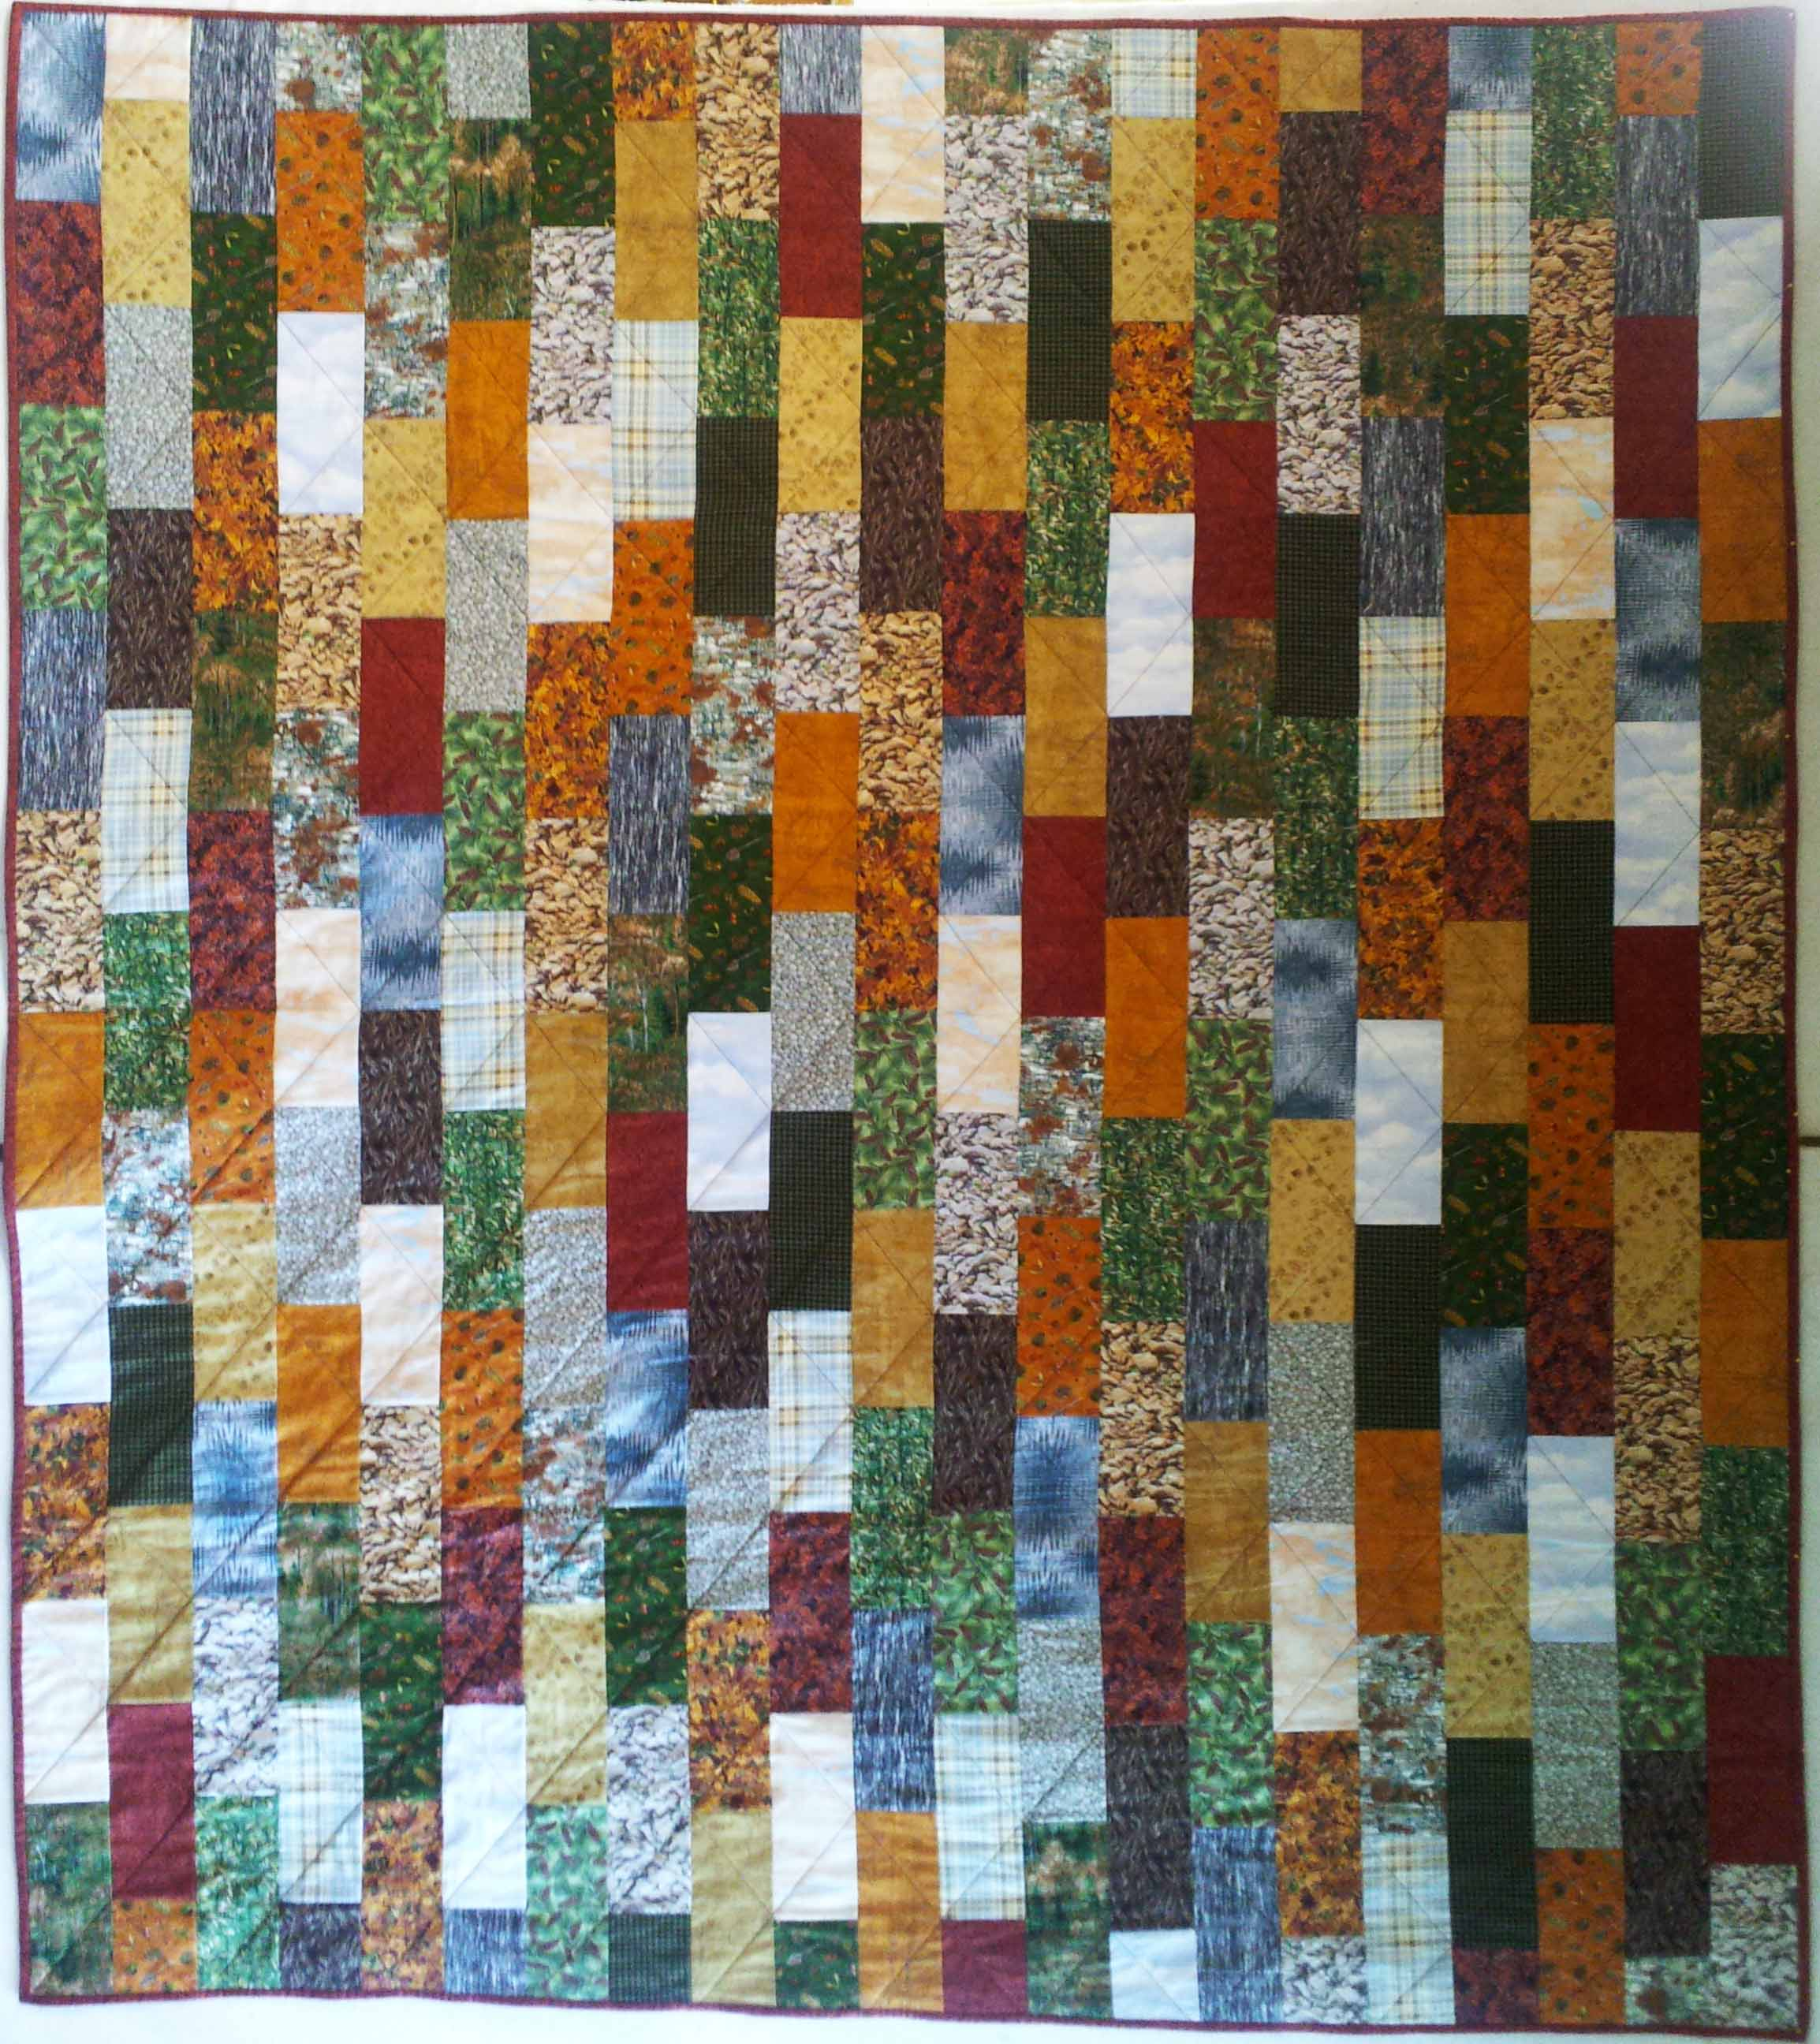 Patchwork Quilts : nature quilt - Adamdwight.com